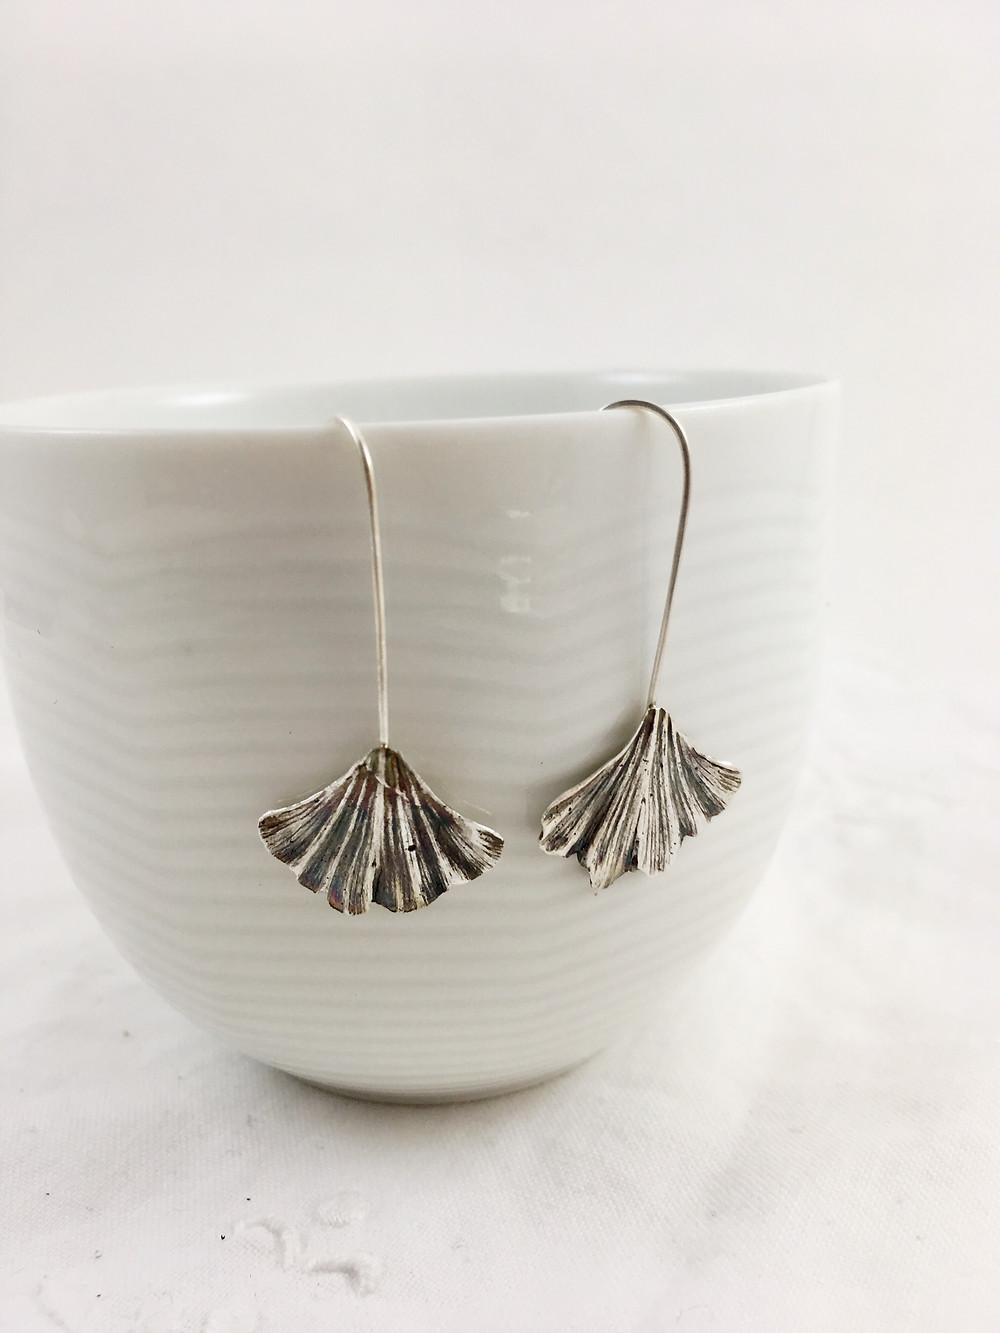 gingko leaf earrings botanical jewelry PMC jewelry nature jewelry